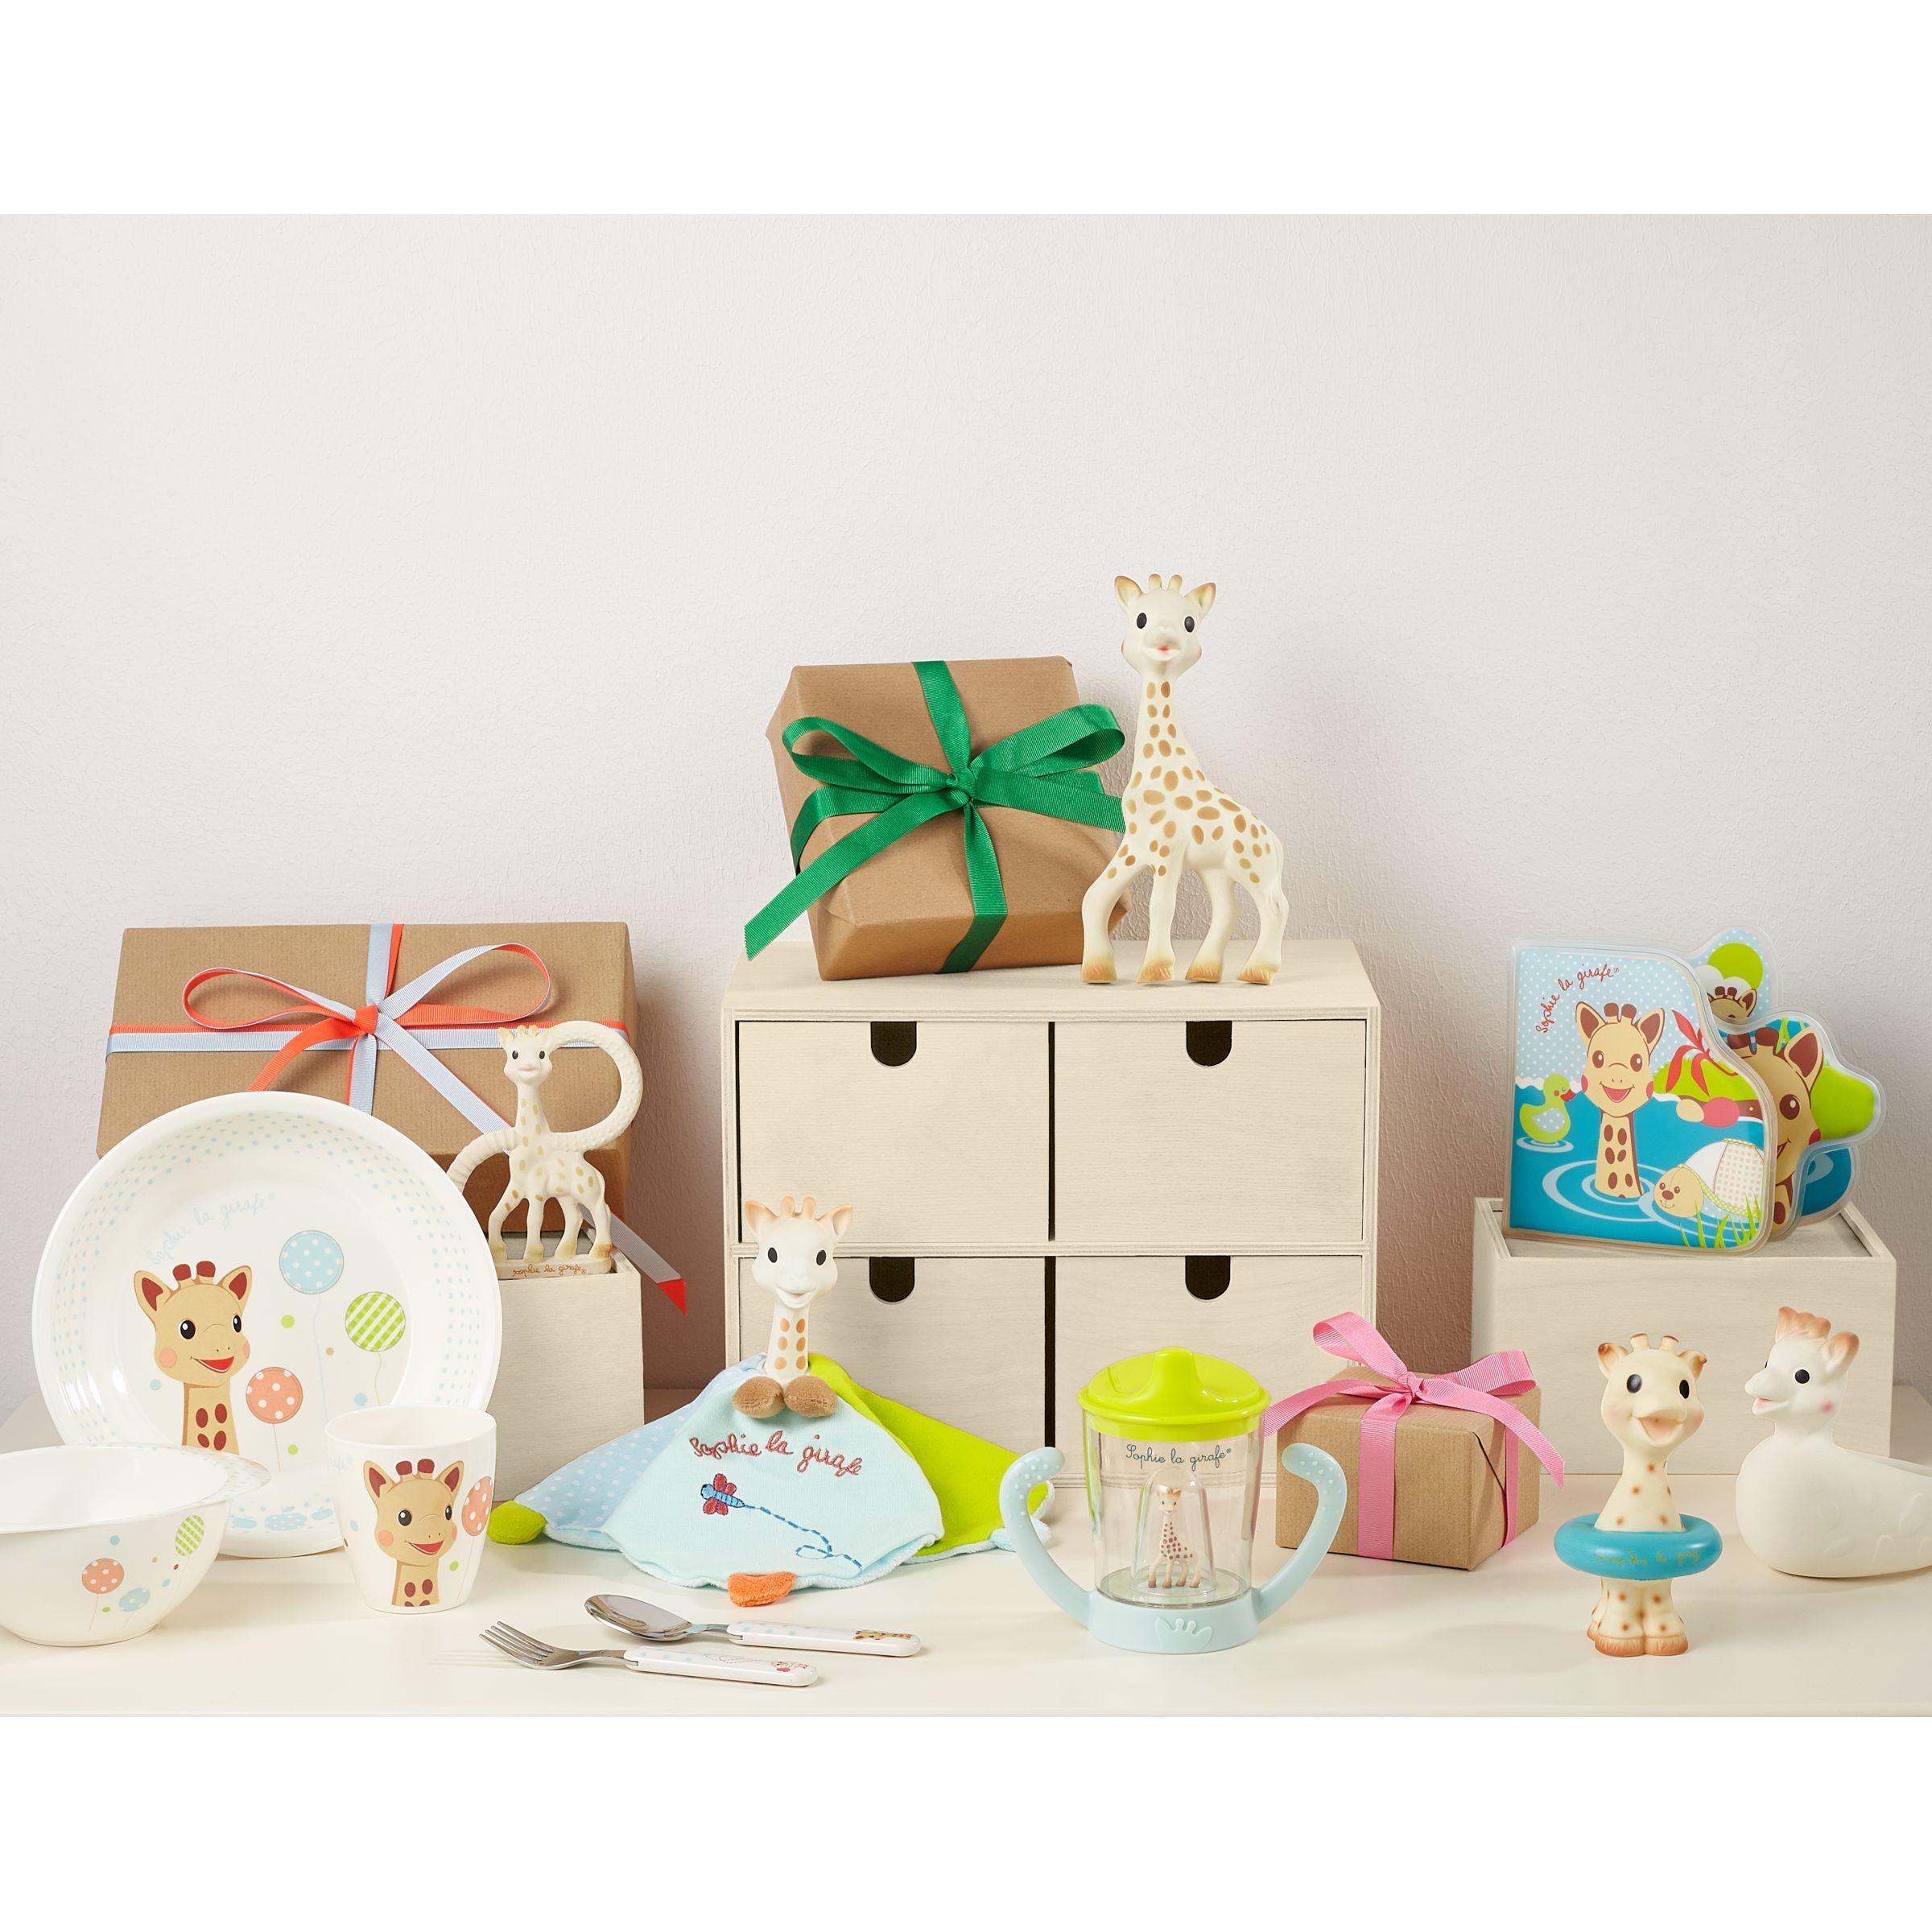 Buy Sophie la Girafe Teether in Gift Box John Lewis